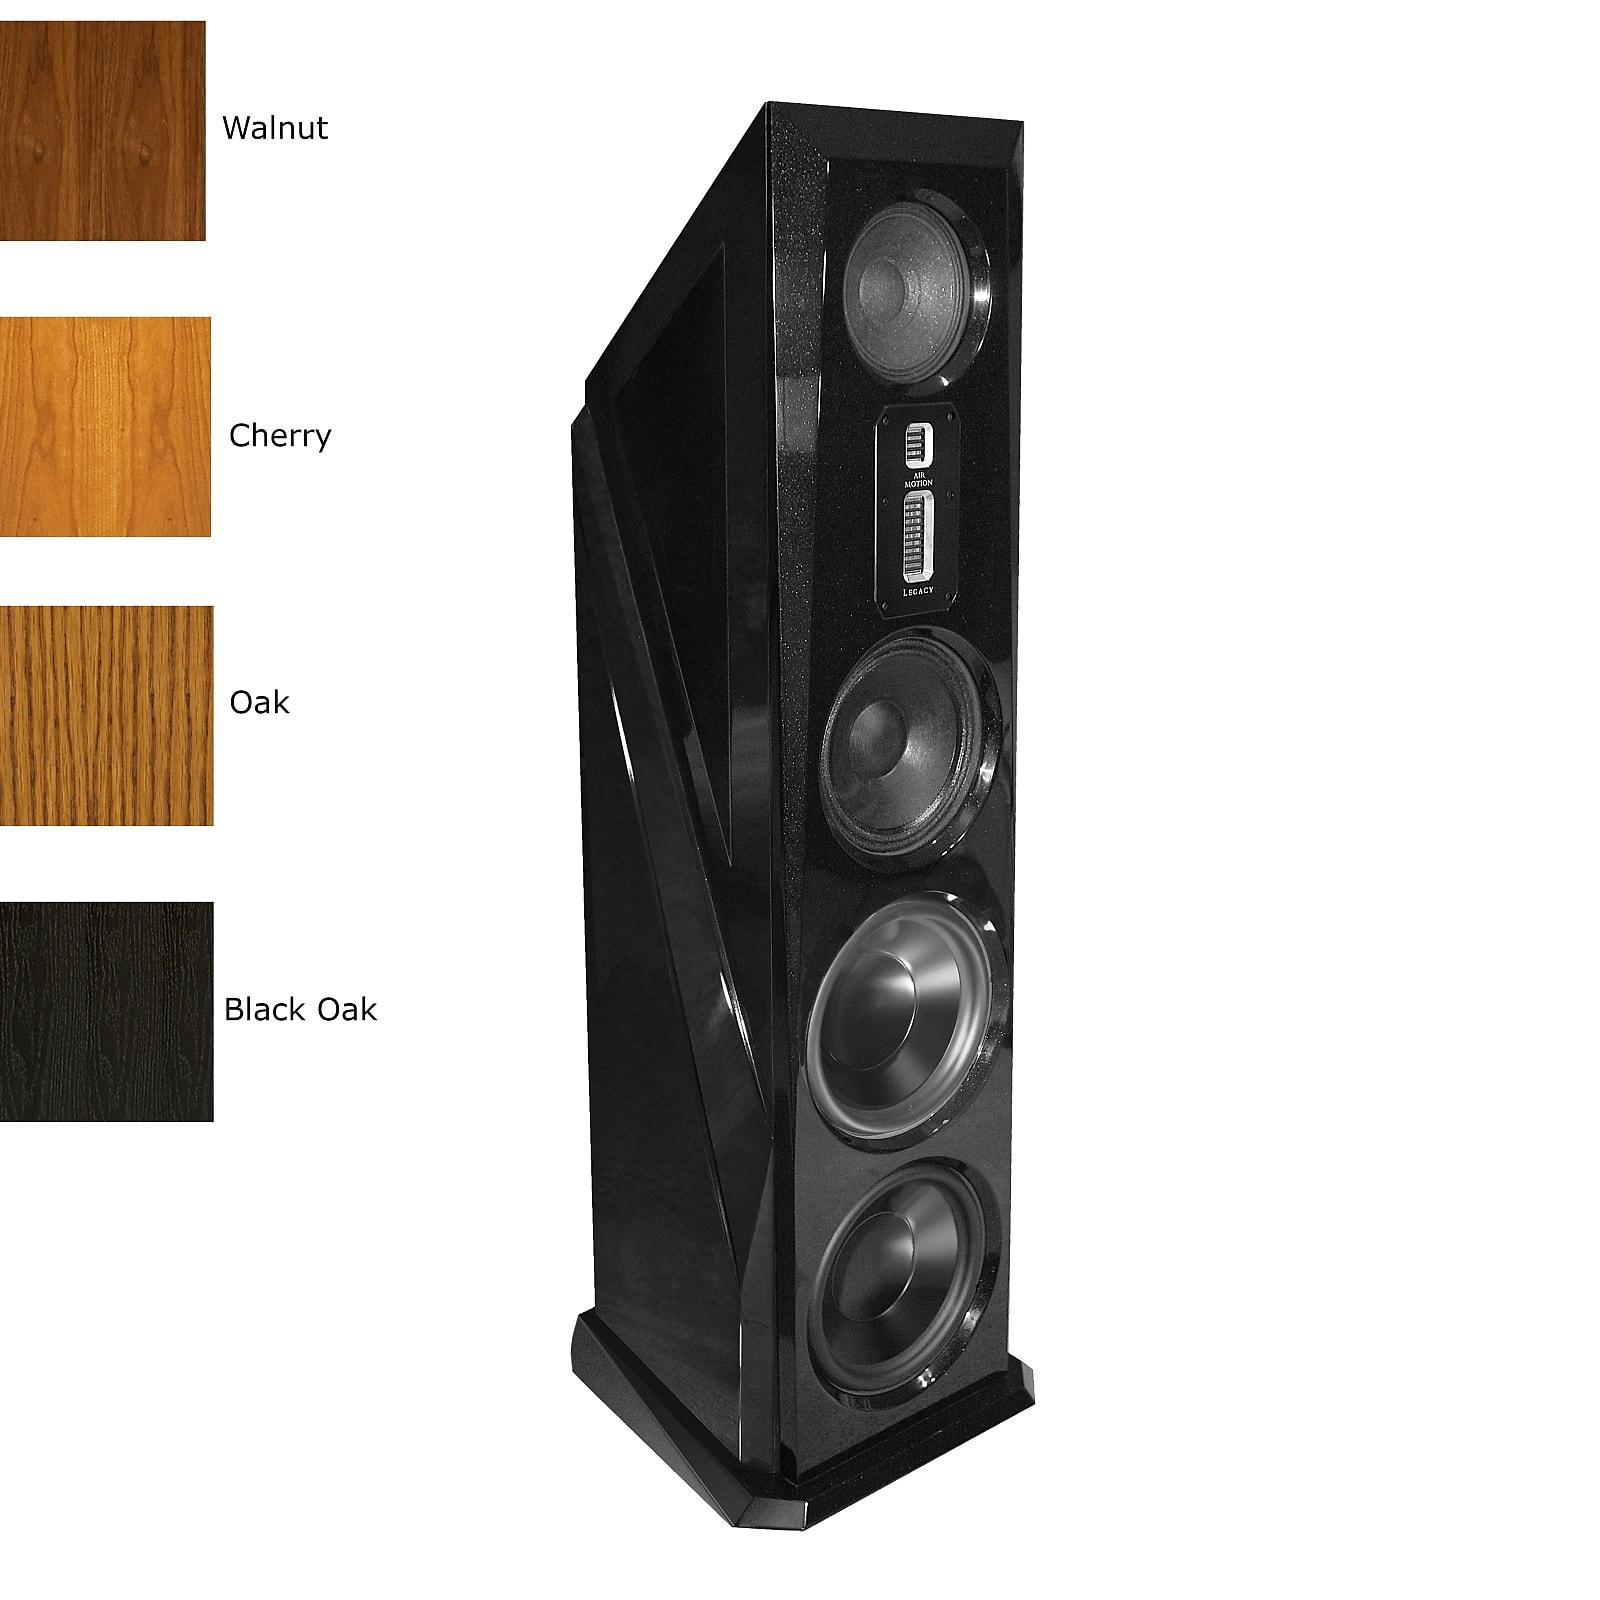 Legacy Audio AERIS Floor Speakers (Pair) - Walnut